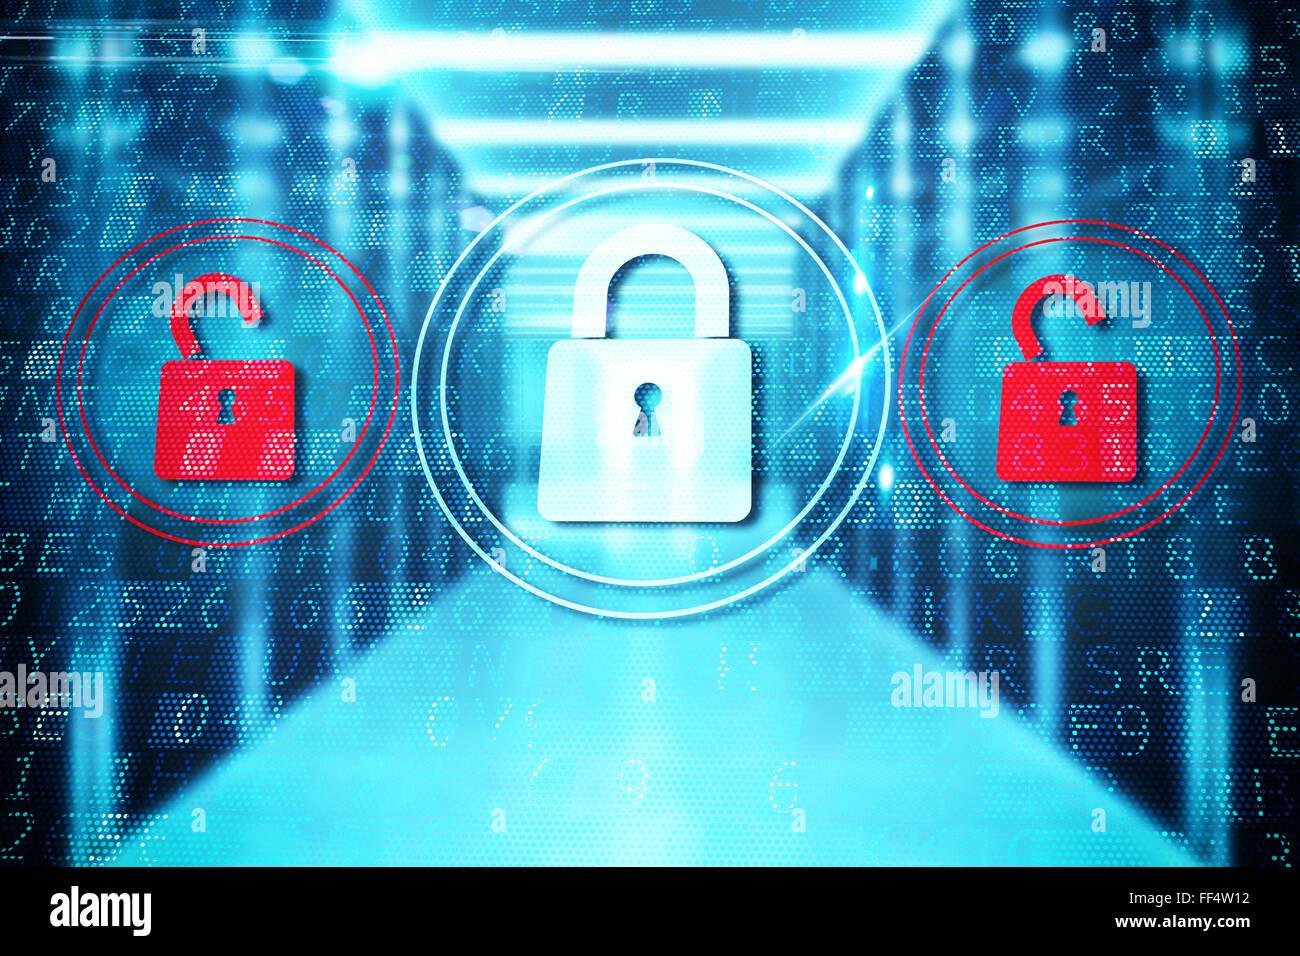 Security closed padlock - Stock Image